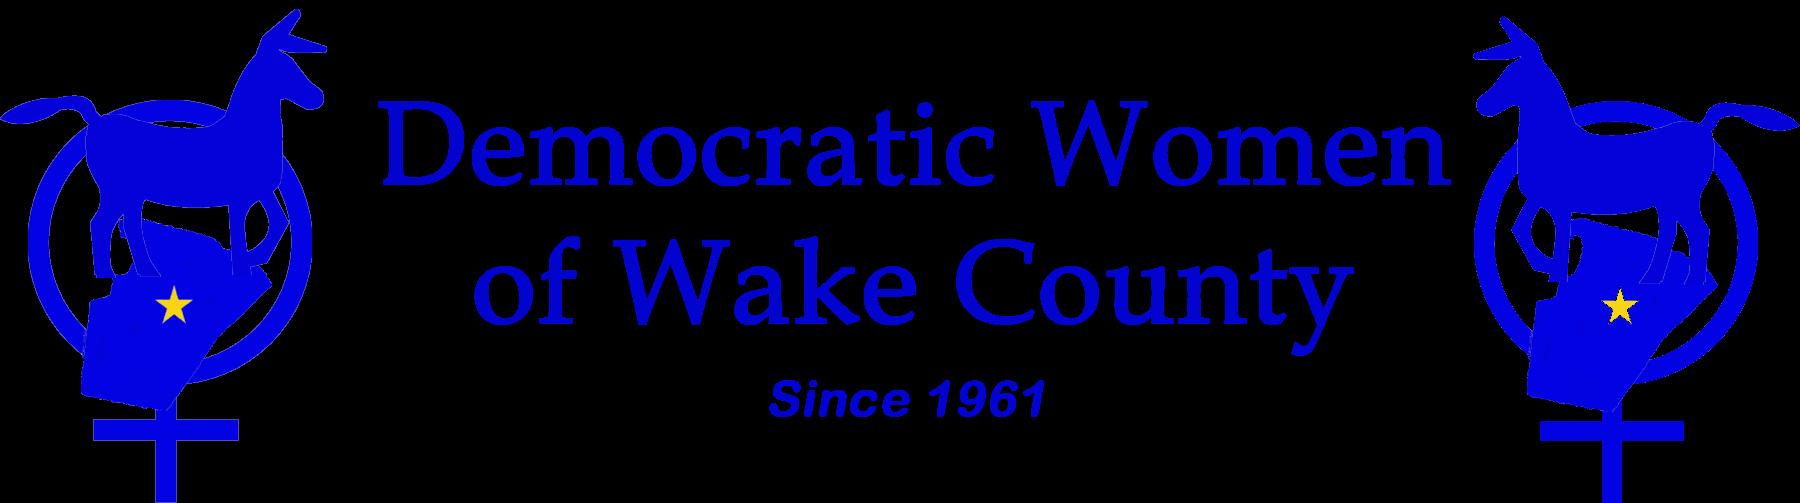 Democratic Women of Wake County (NC)